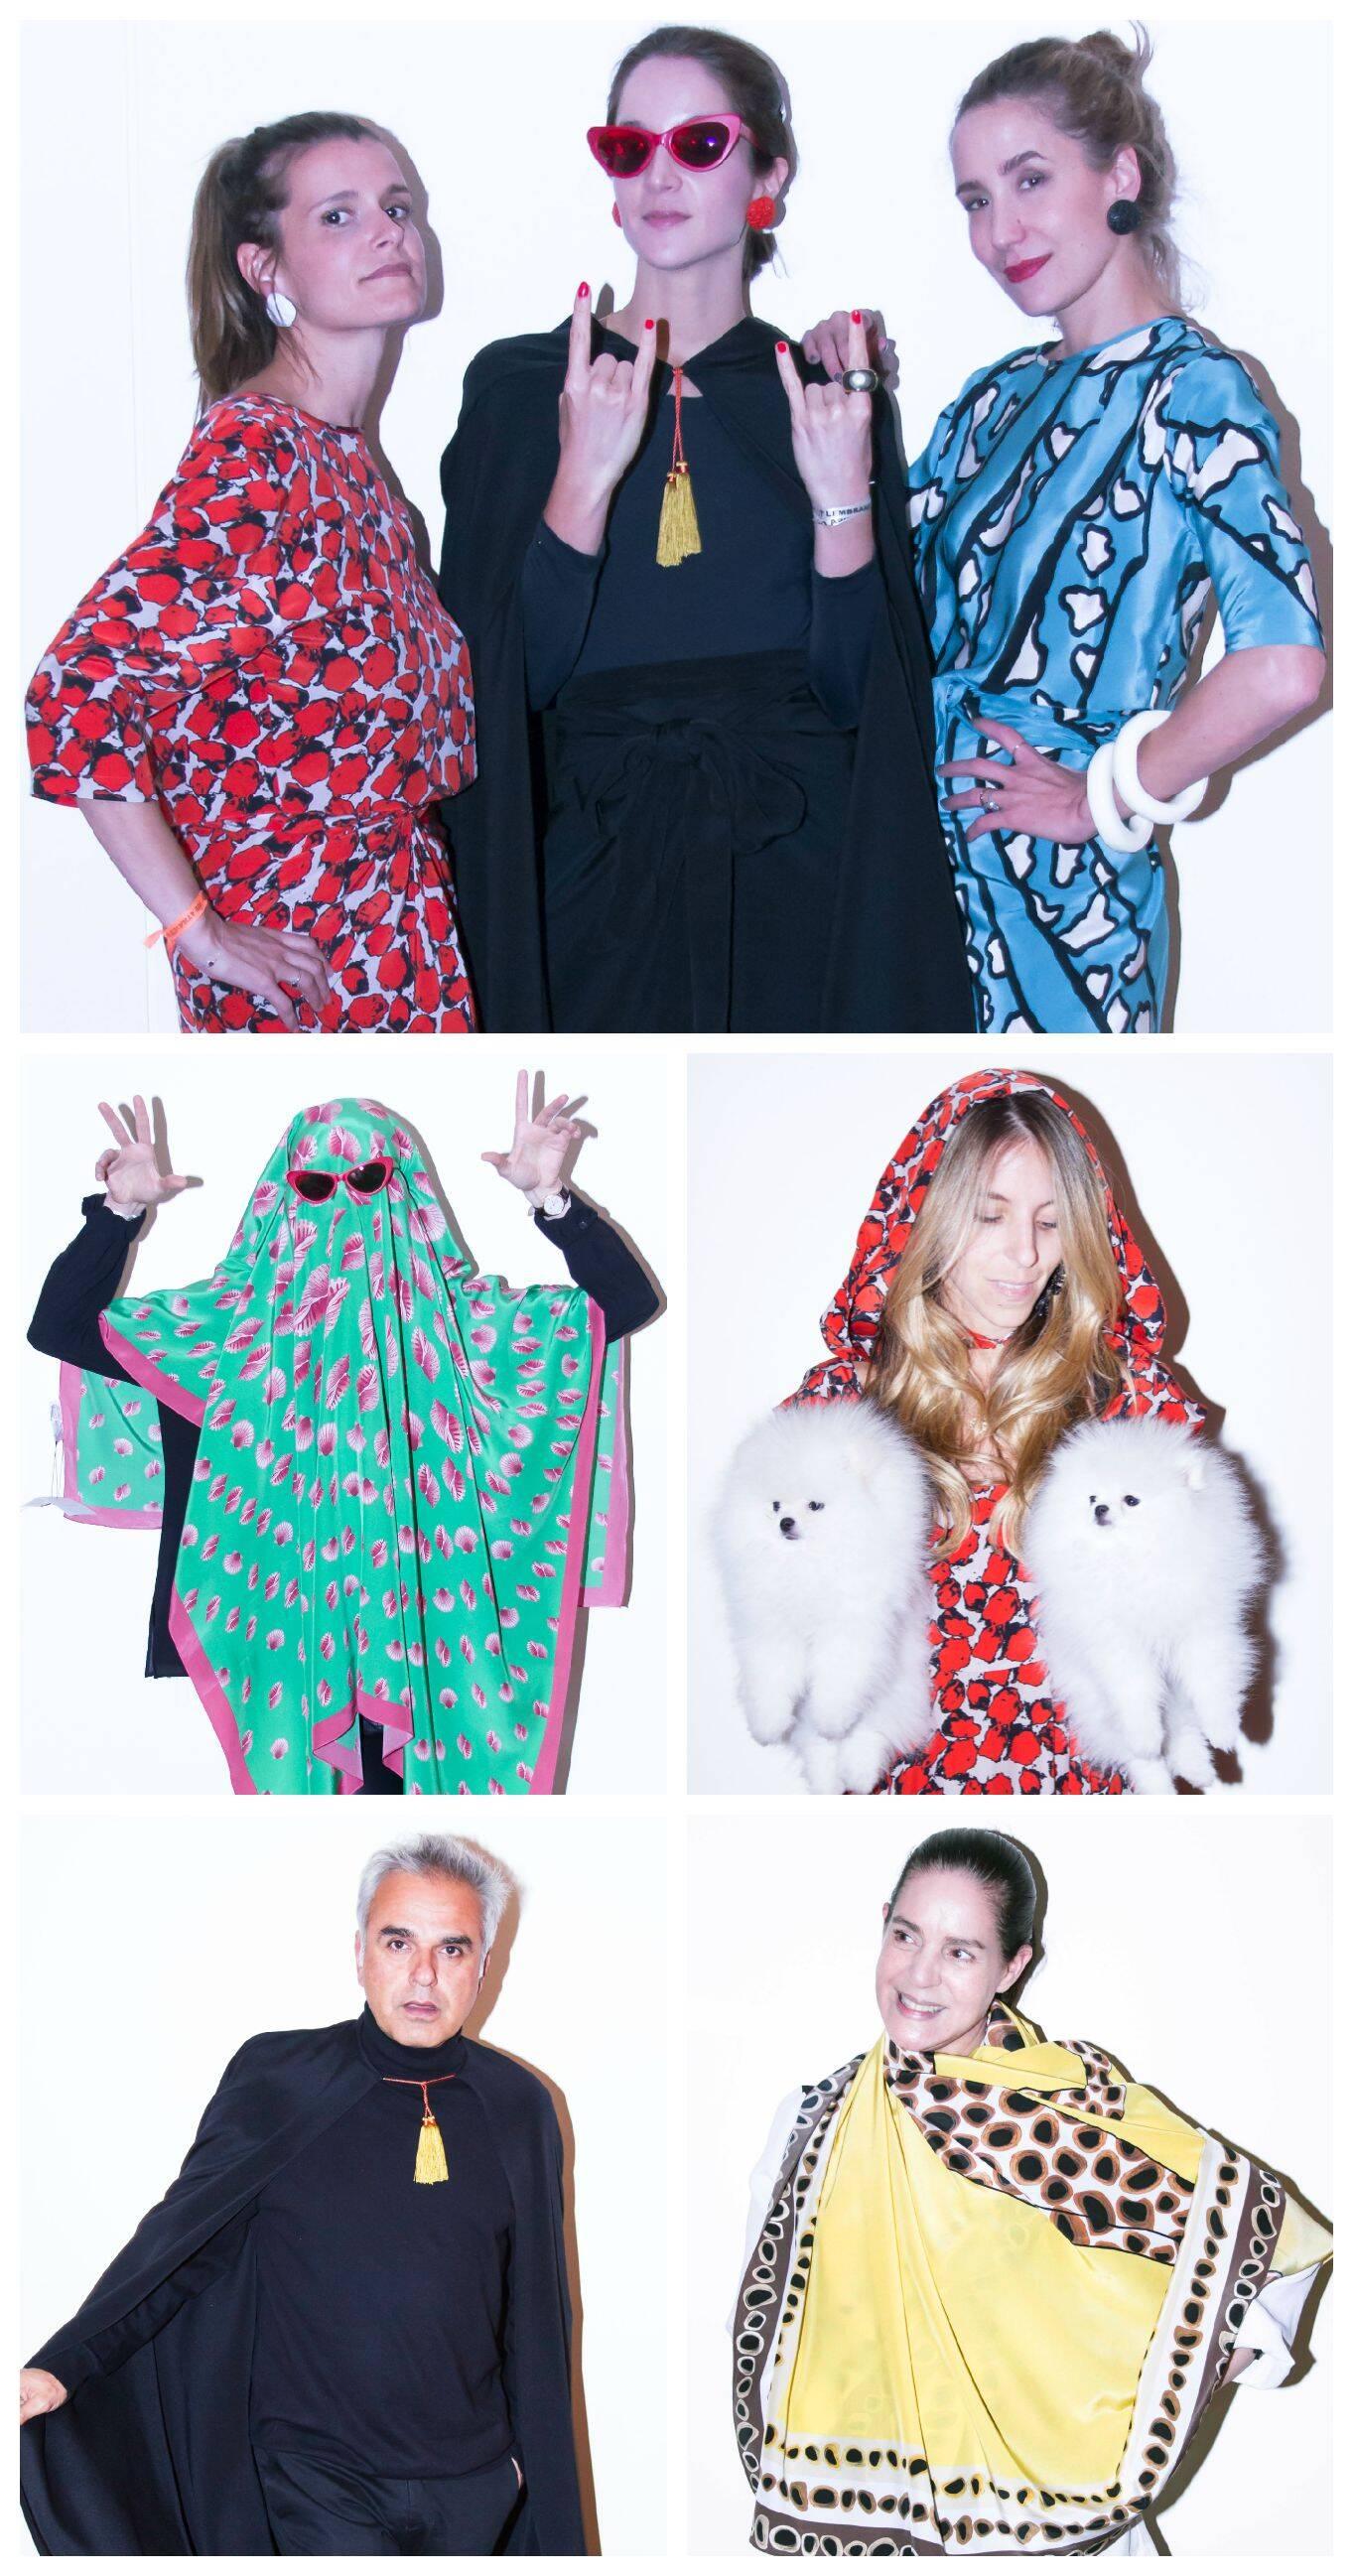 Eugenia Maia, Vanda Jacintho, Paola Orleans; Stella Jacintho; Marcia Jacintho; Marcio Vicentini; Camilla Bossolan / Fotos: Guilheme Nabhan